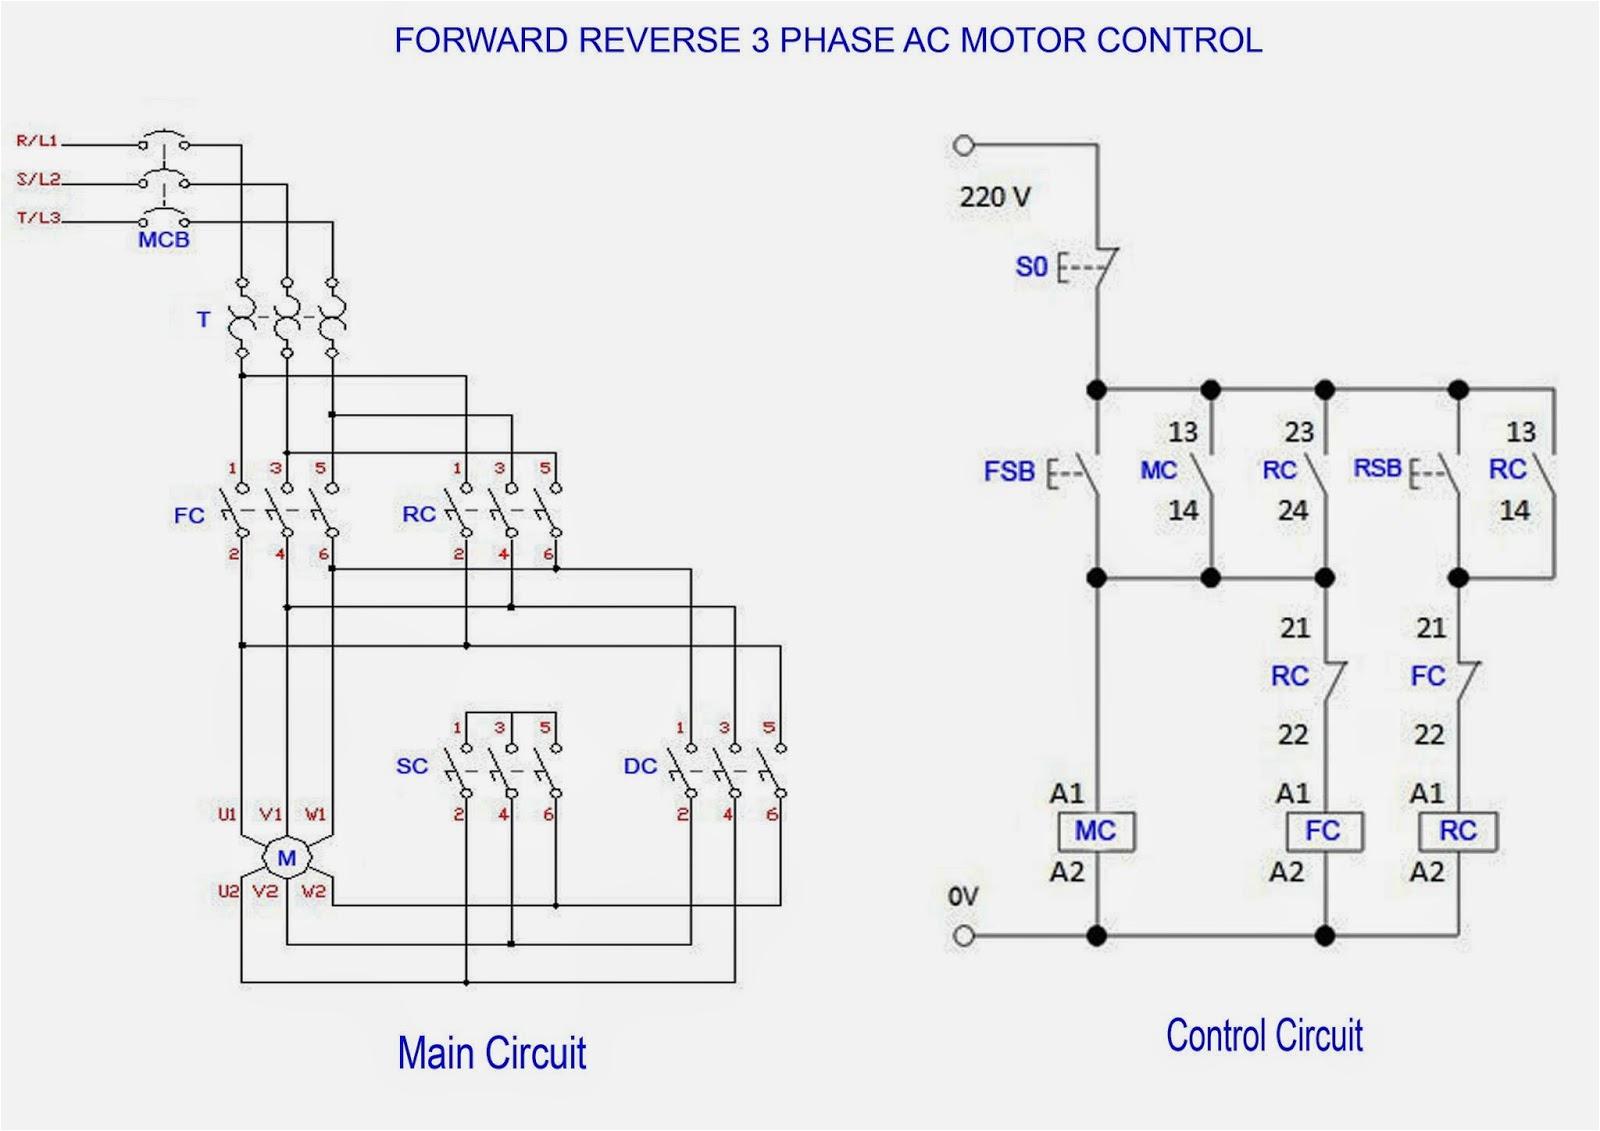 3 Phase Motor Wiring Diagram Tpi Wiring Diagram 3 Phase Electric Heater Wiring Diagram Expert